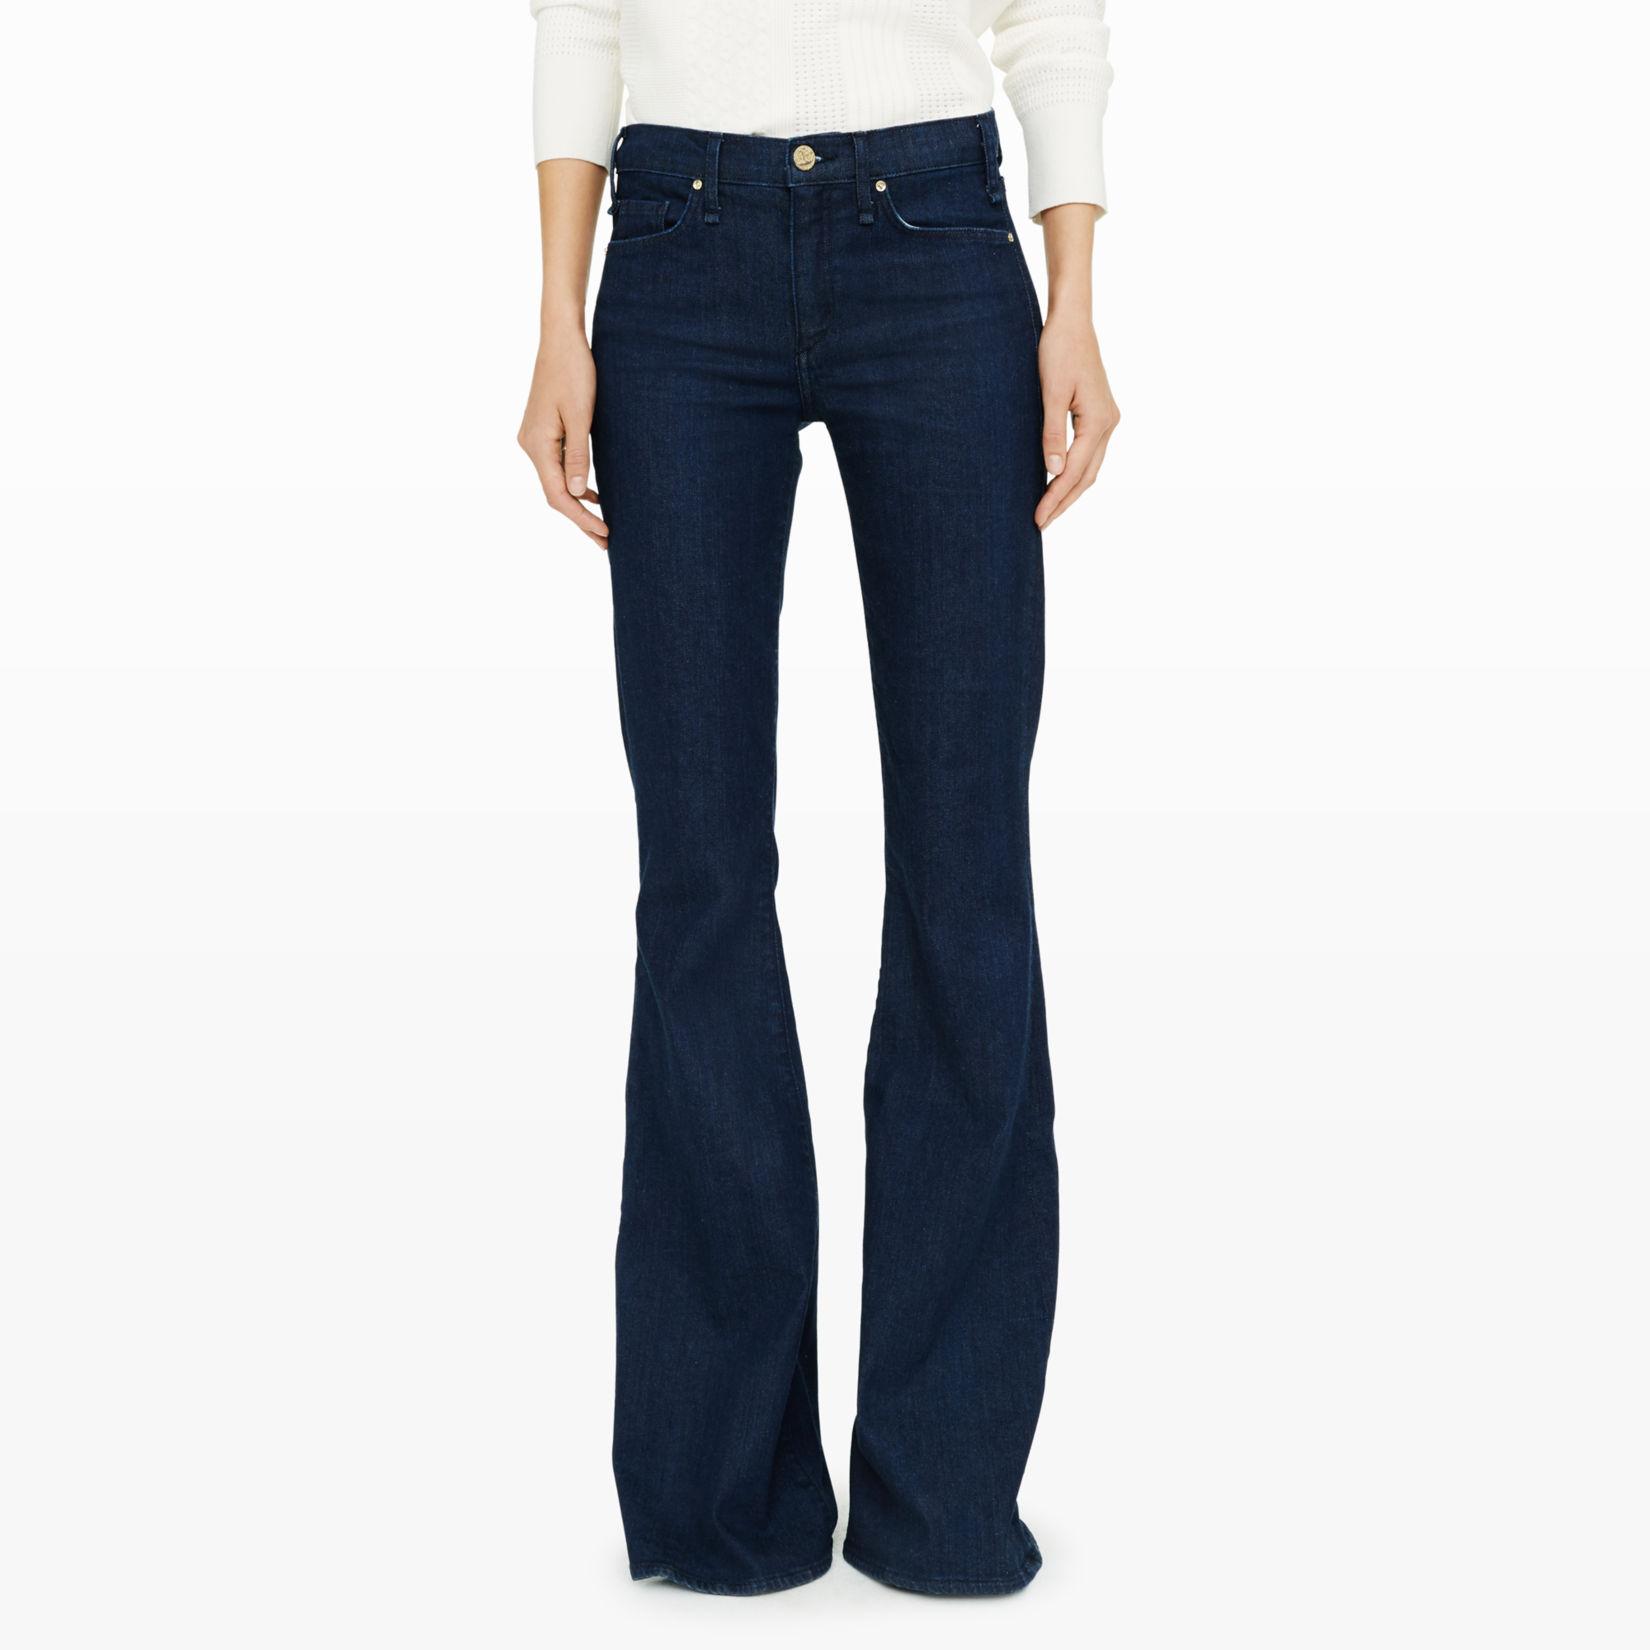 Womens | Jeans | McGuire Majorelle Flare Jean | Club Monaco